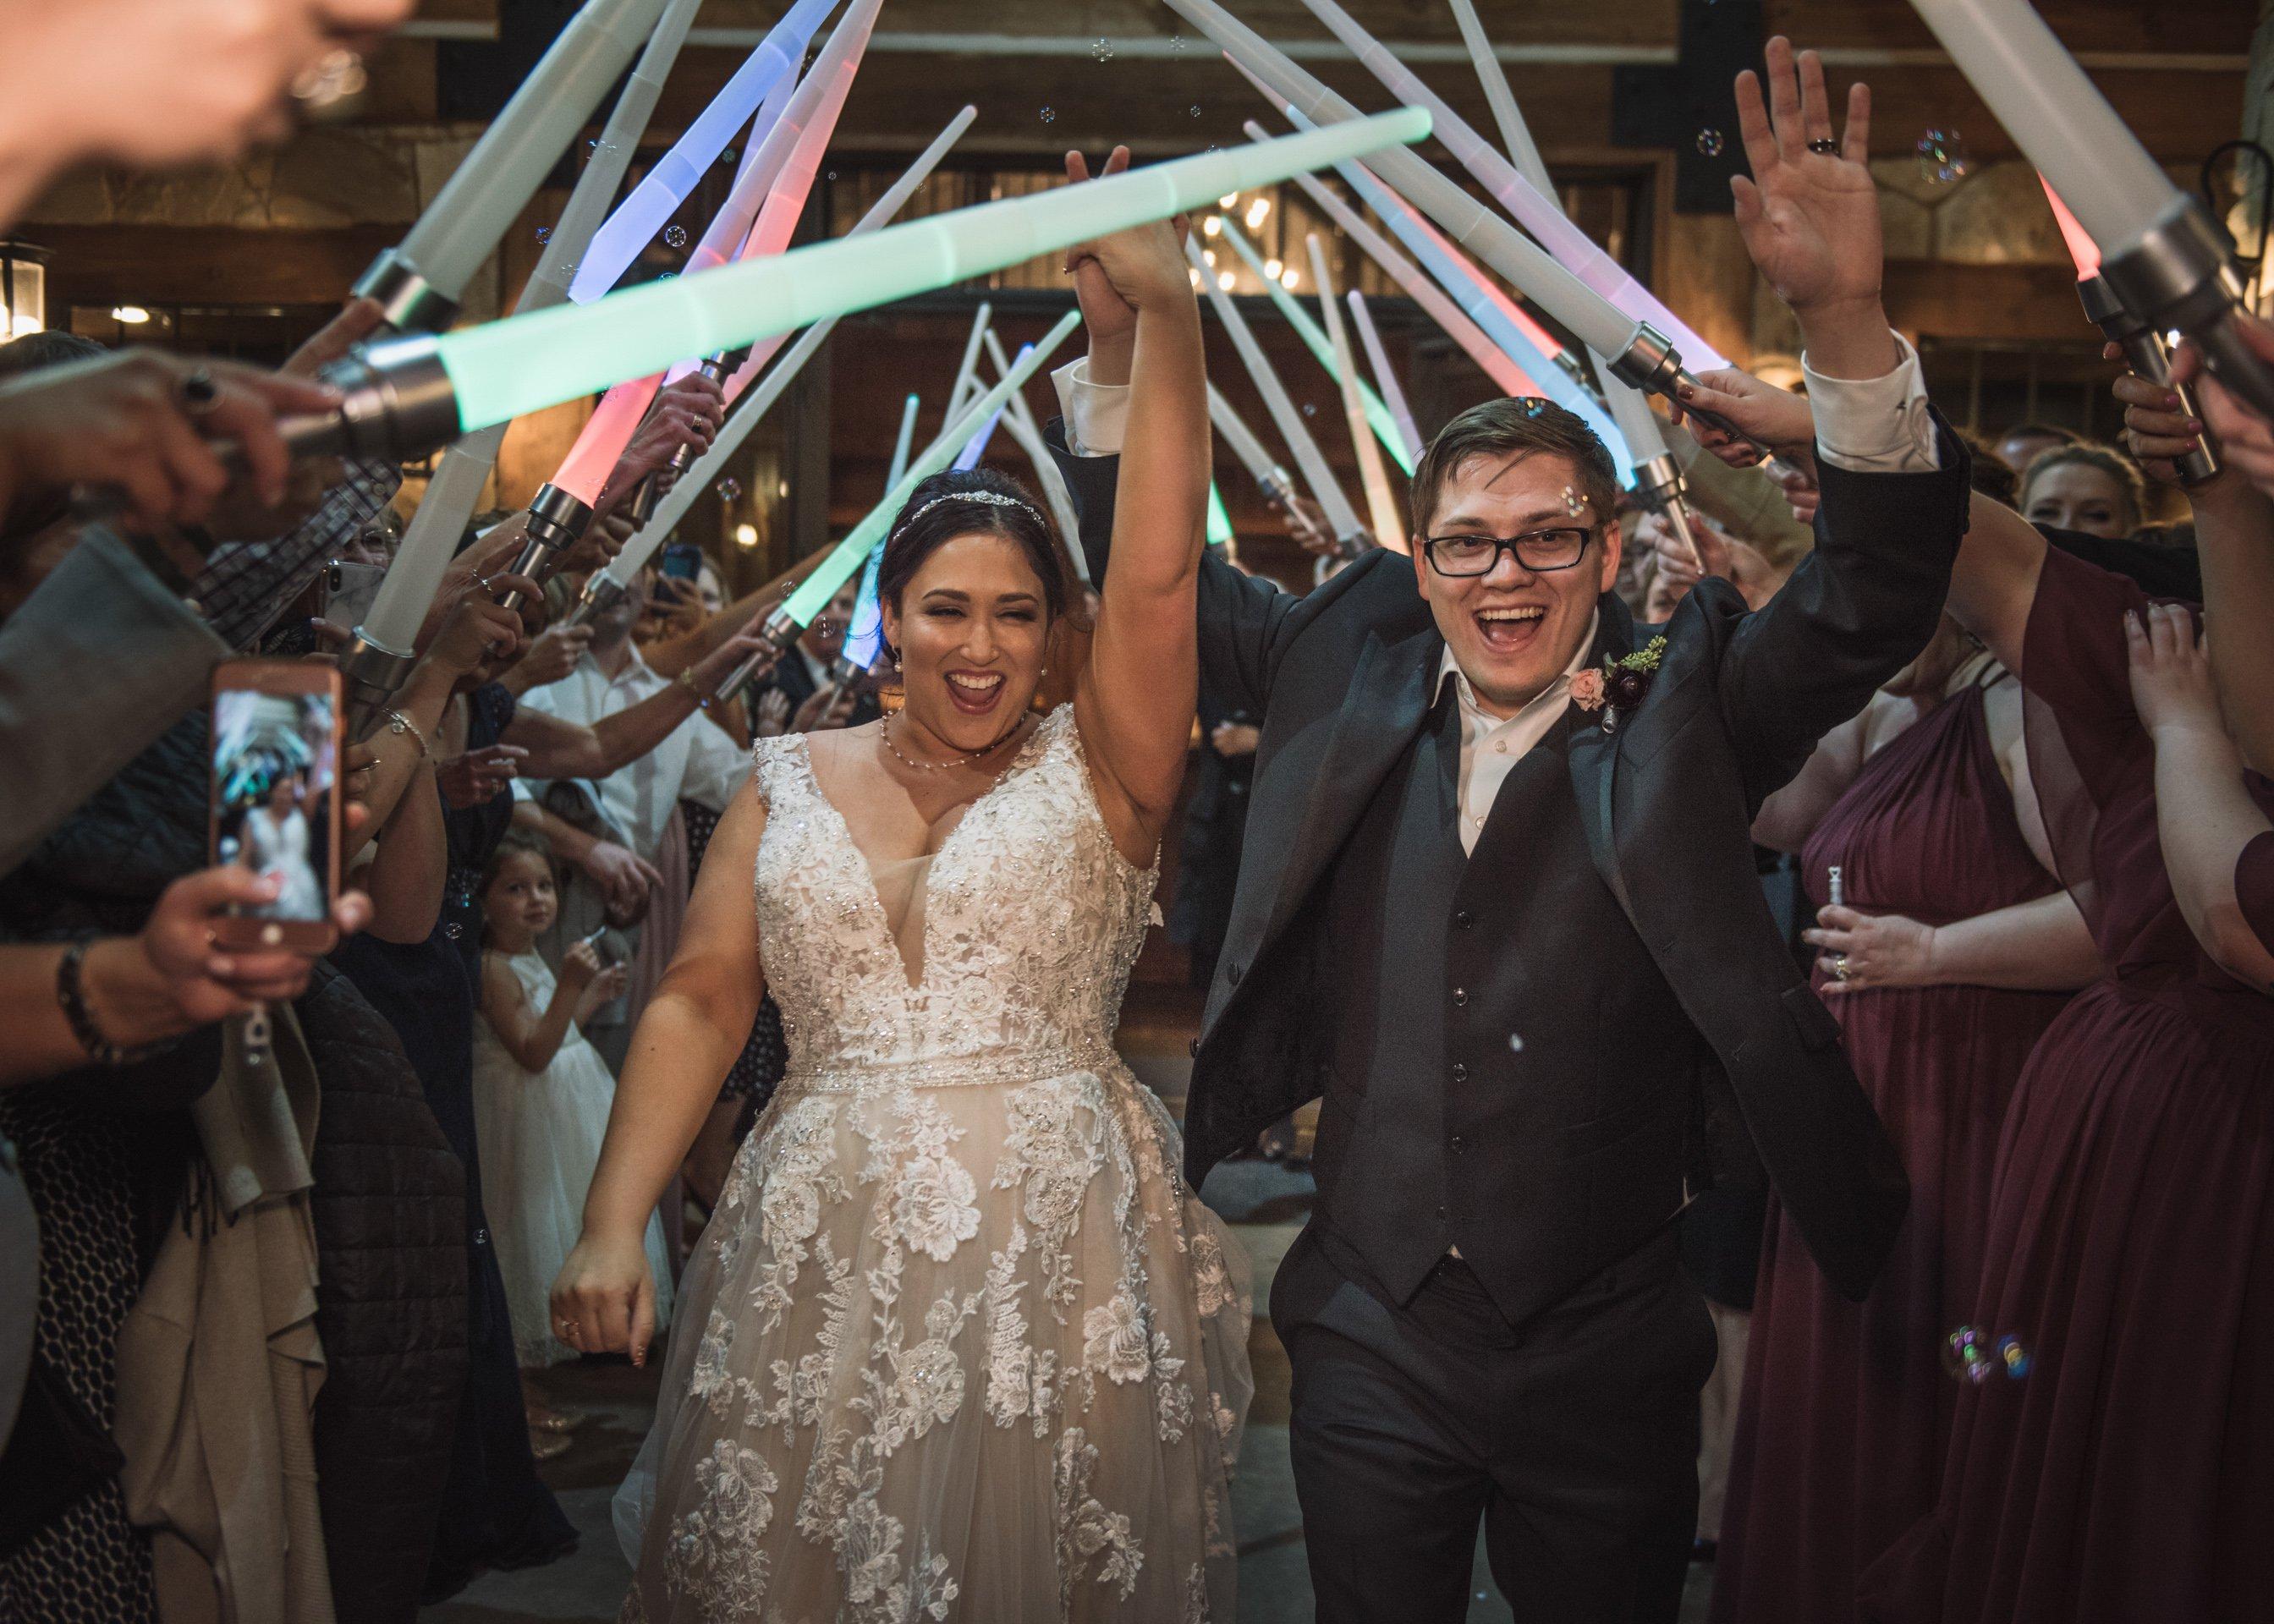 Polk Wedding - Miranda Marrs Photo - Exit